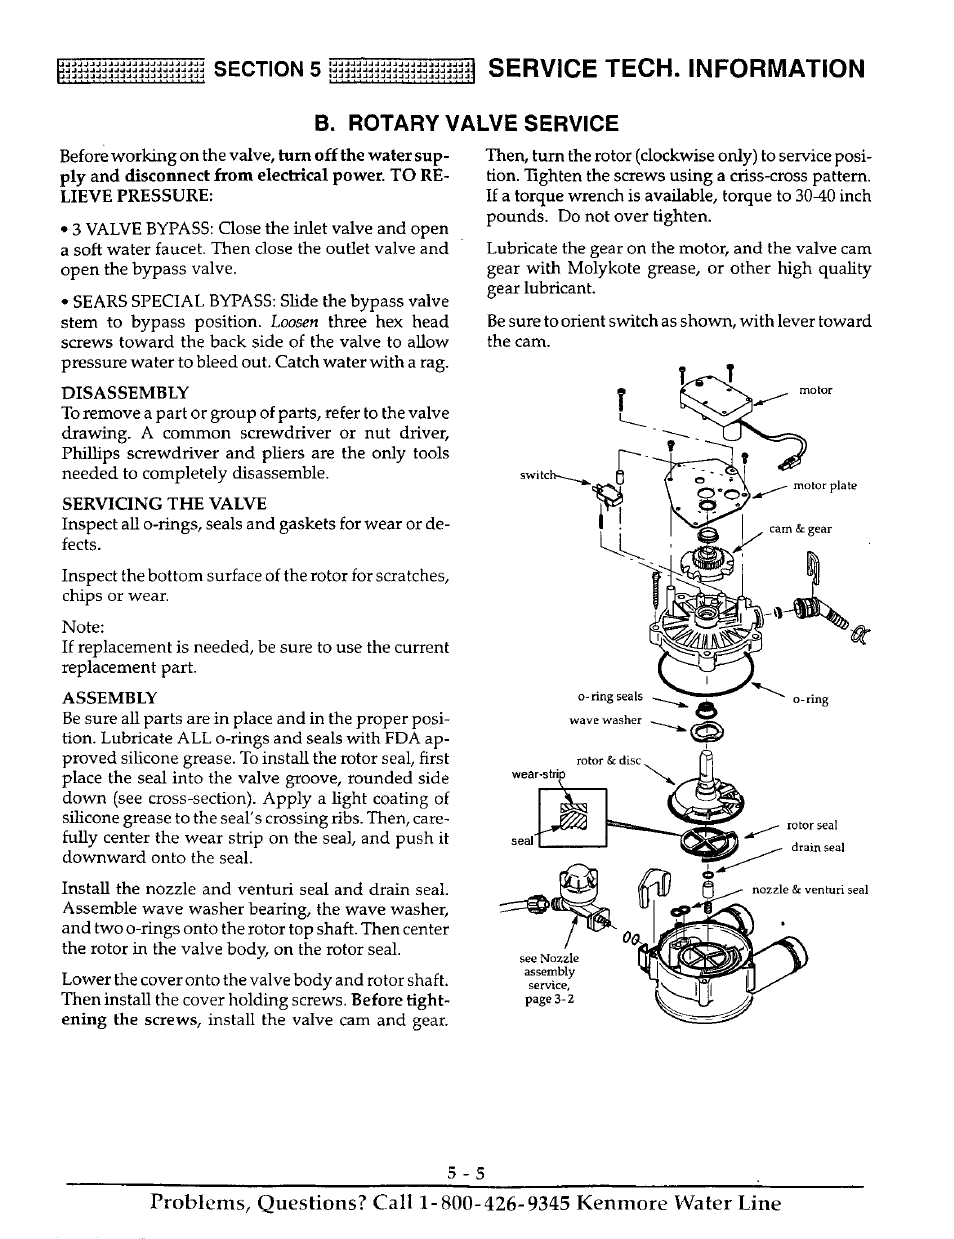 Service tech. information, B. rotary valve service | Kenmore ULTRASOFT 250  625.38826 User